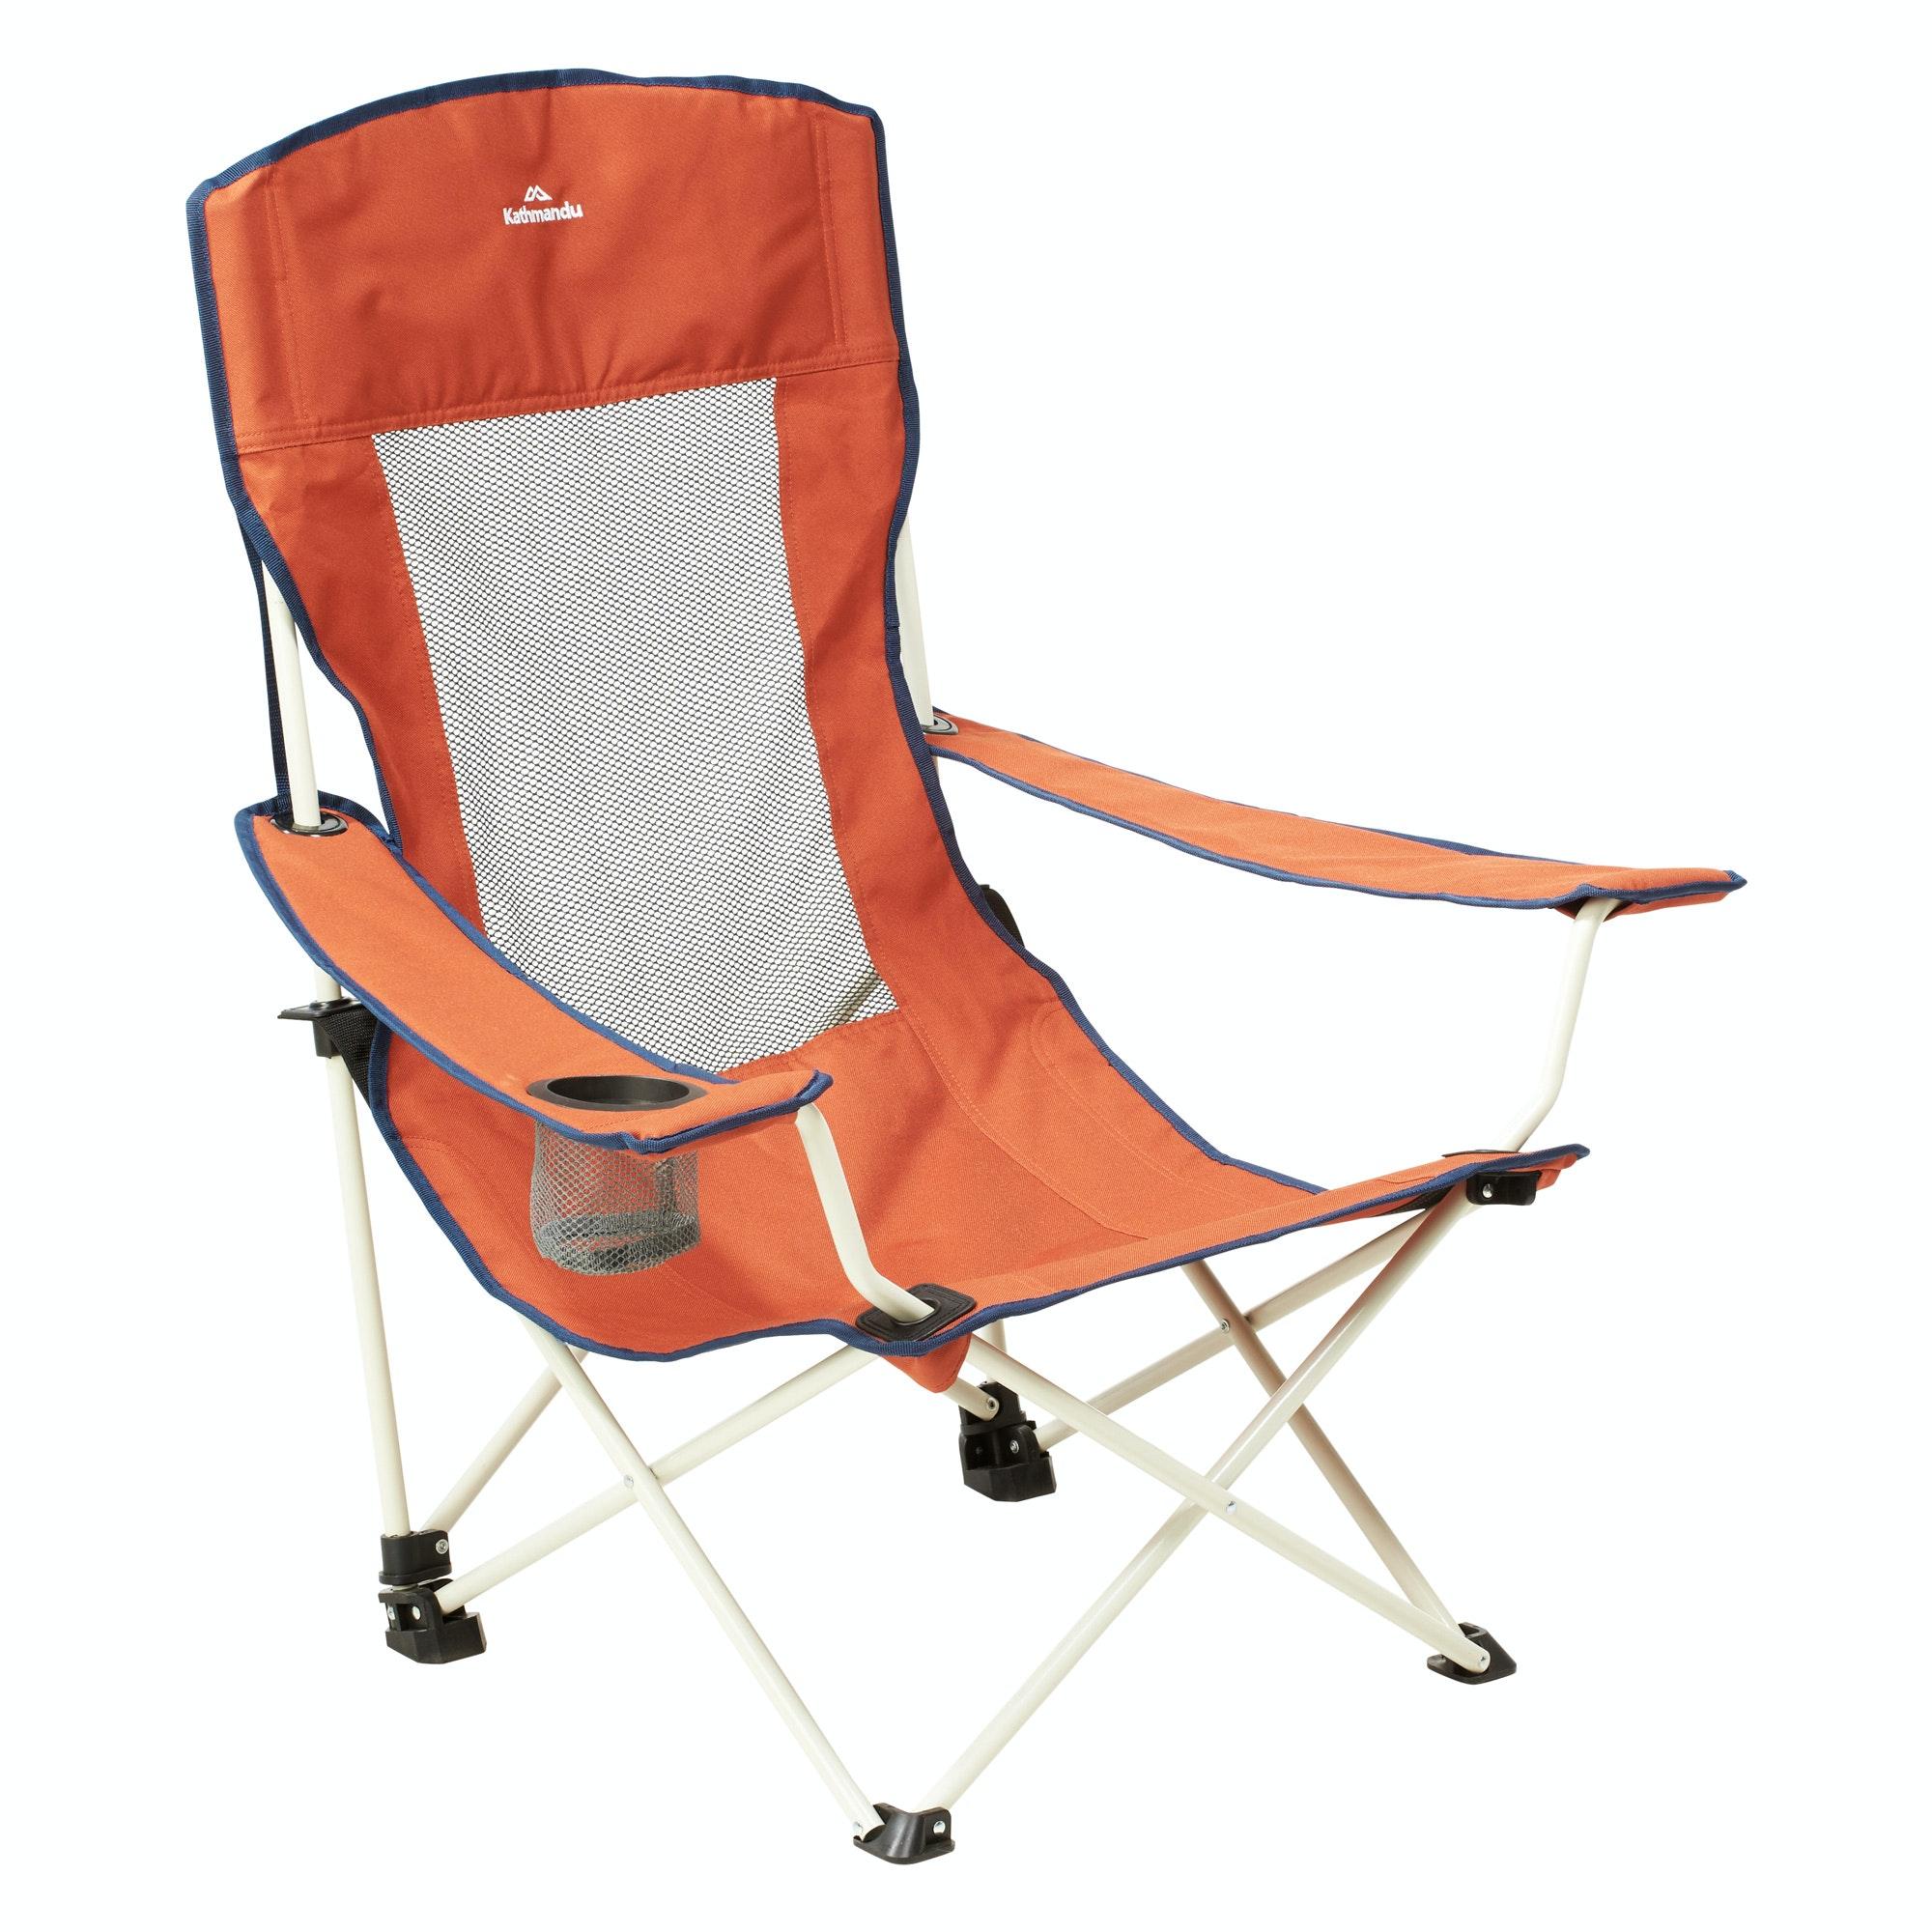 folding chair nepal swing dedon kathmandu roamer hi back portable camping picnic